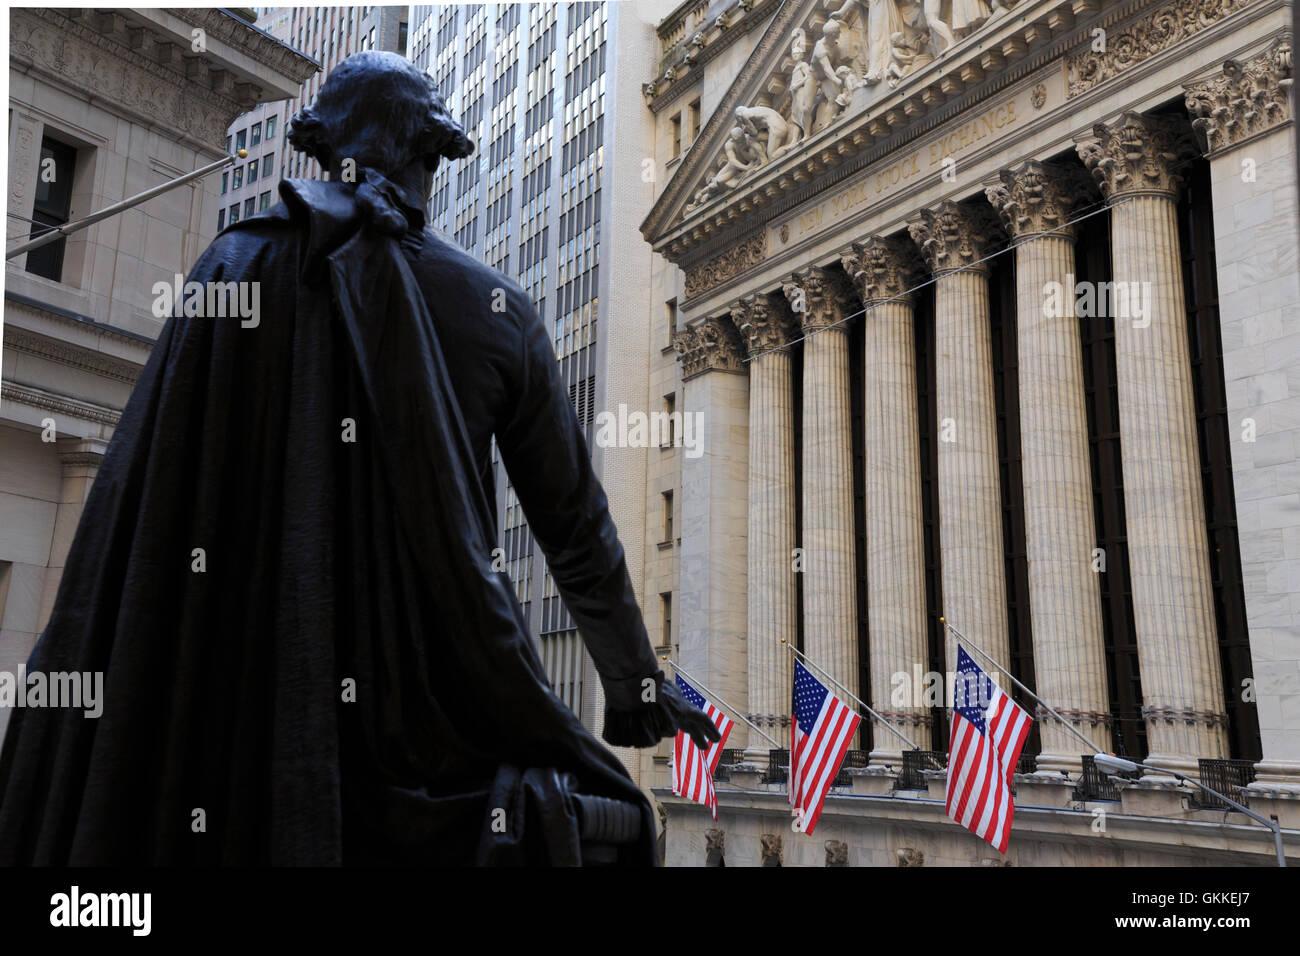 USA, New York, New York, Manhattan, Wall Street Photo Stock